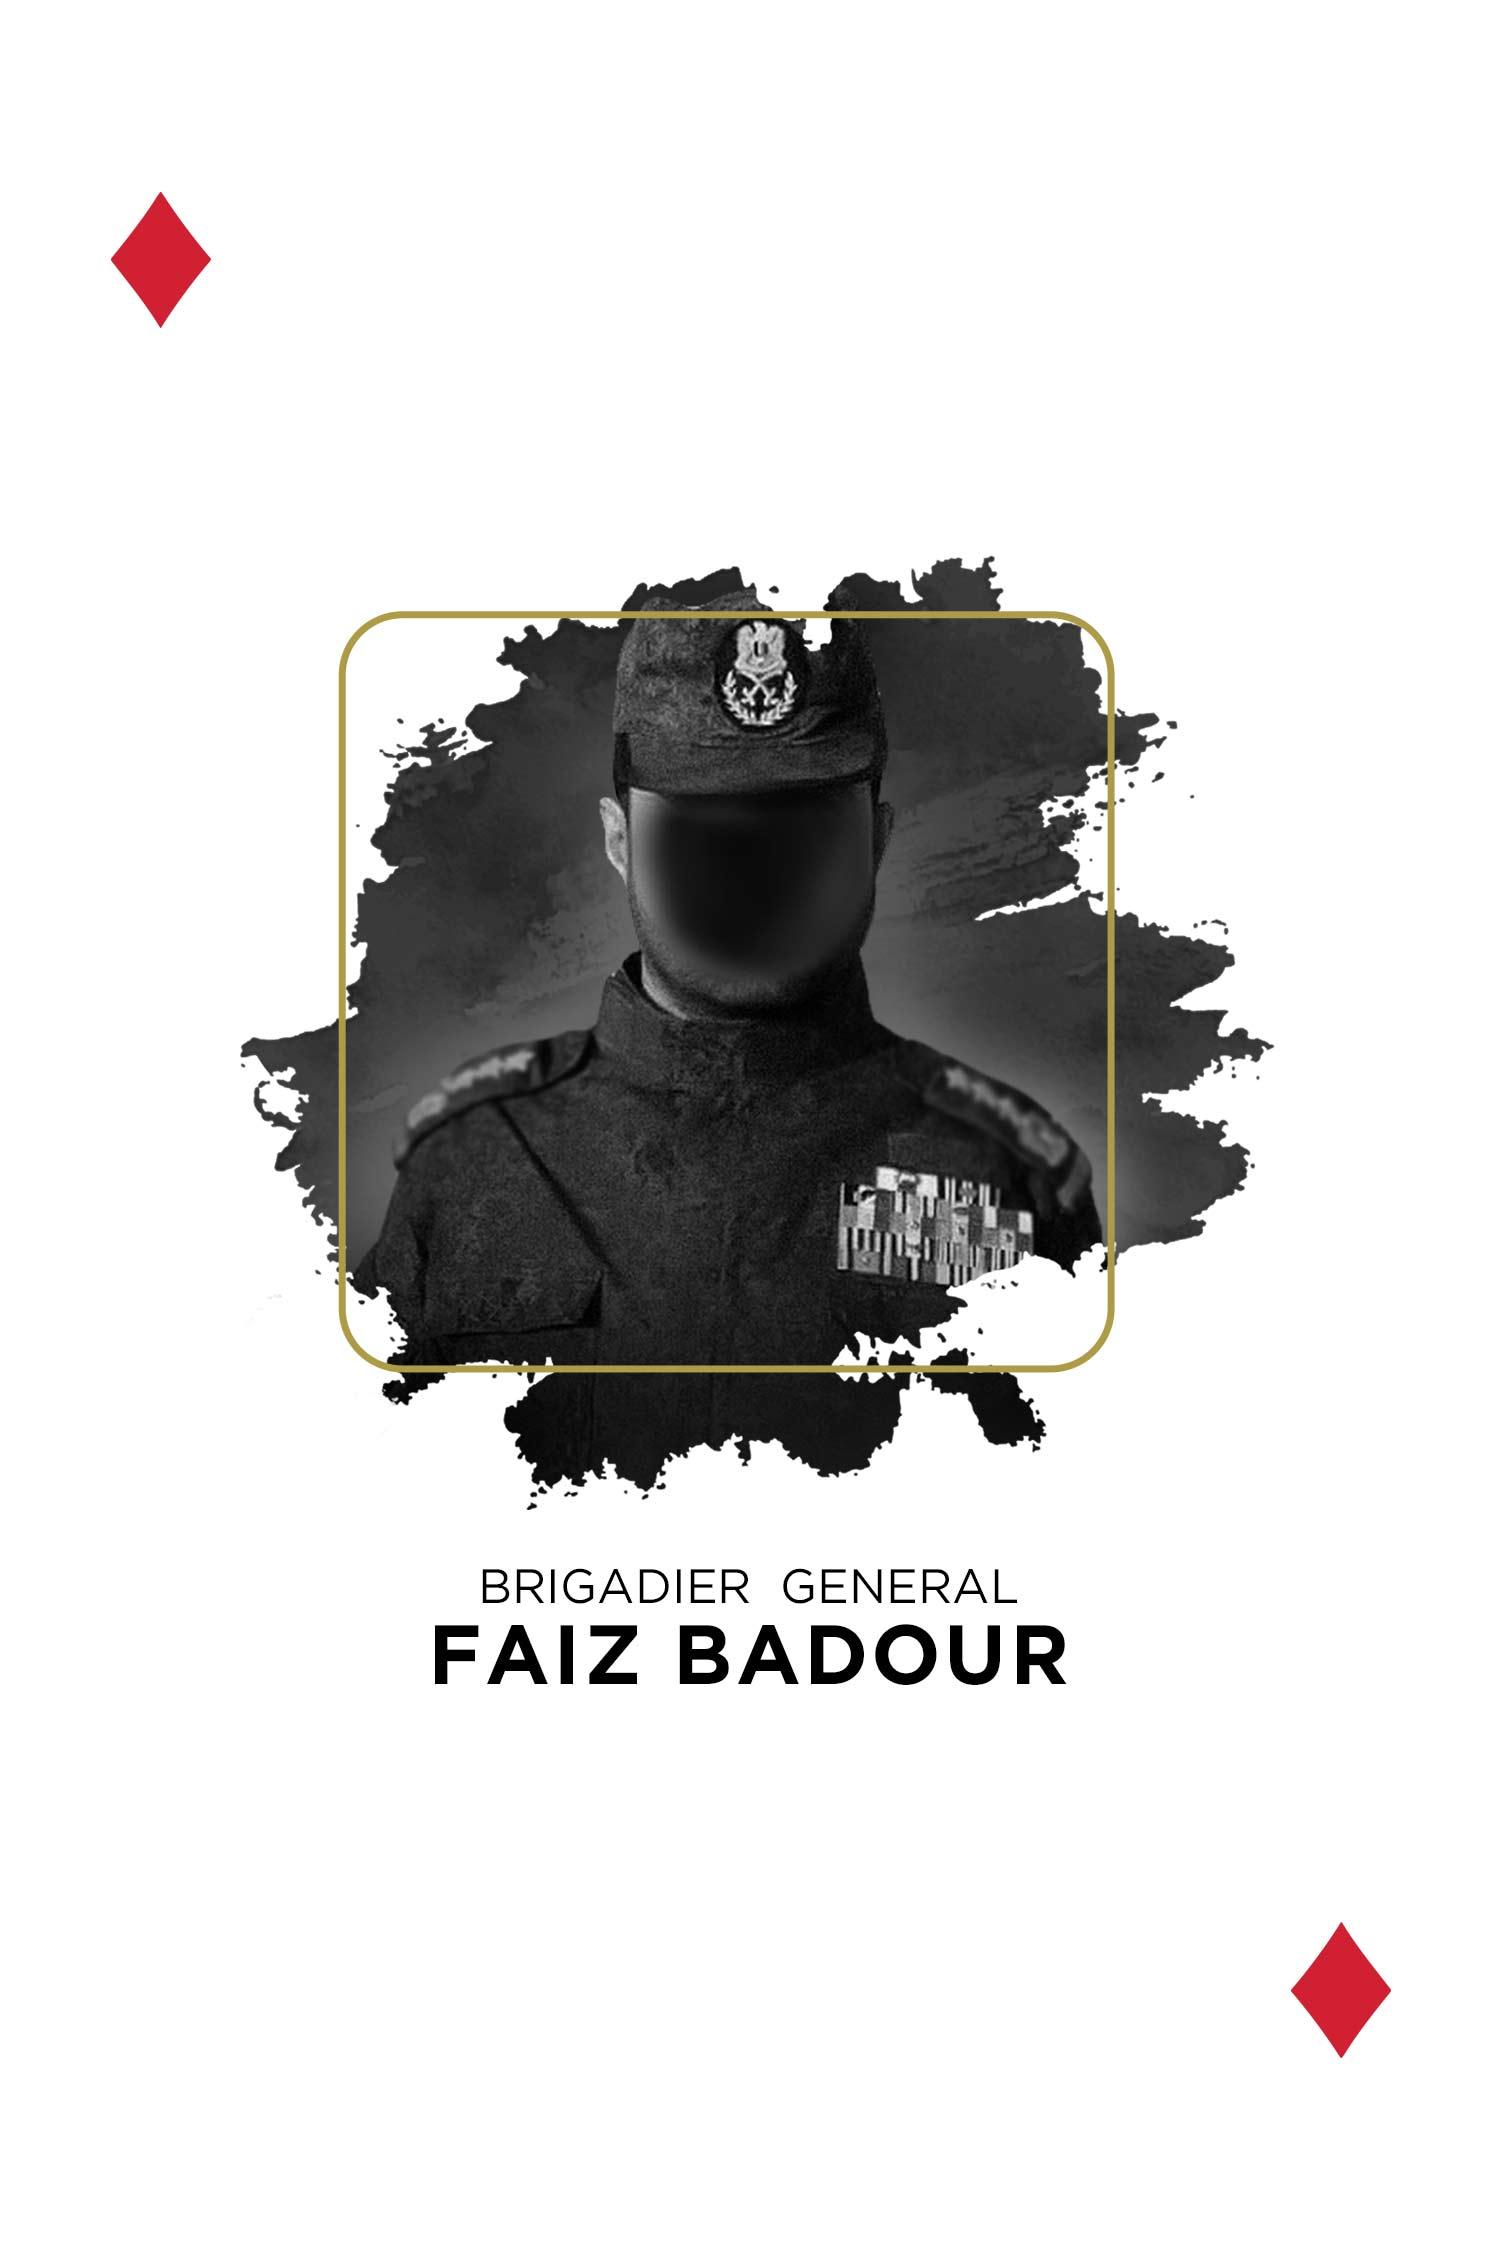 Pro Justice - Fayez Baddour